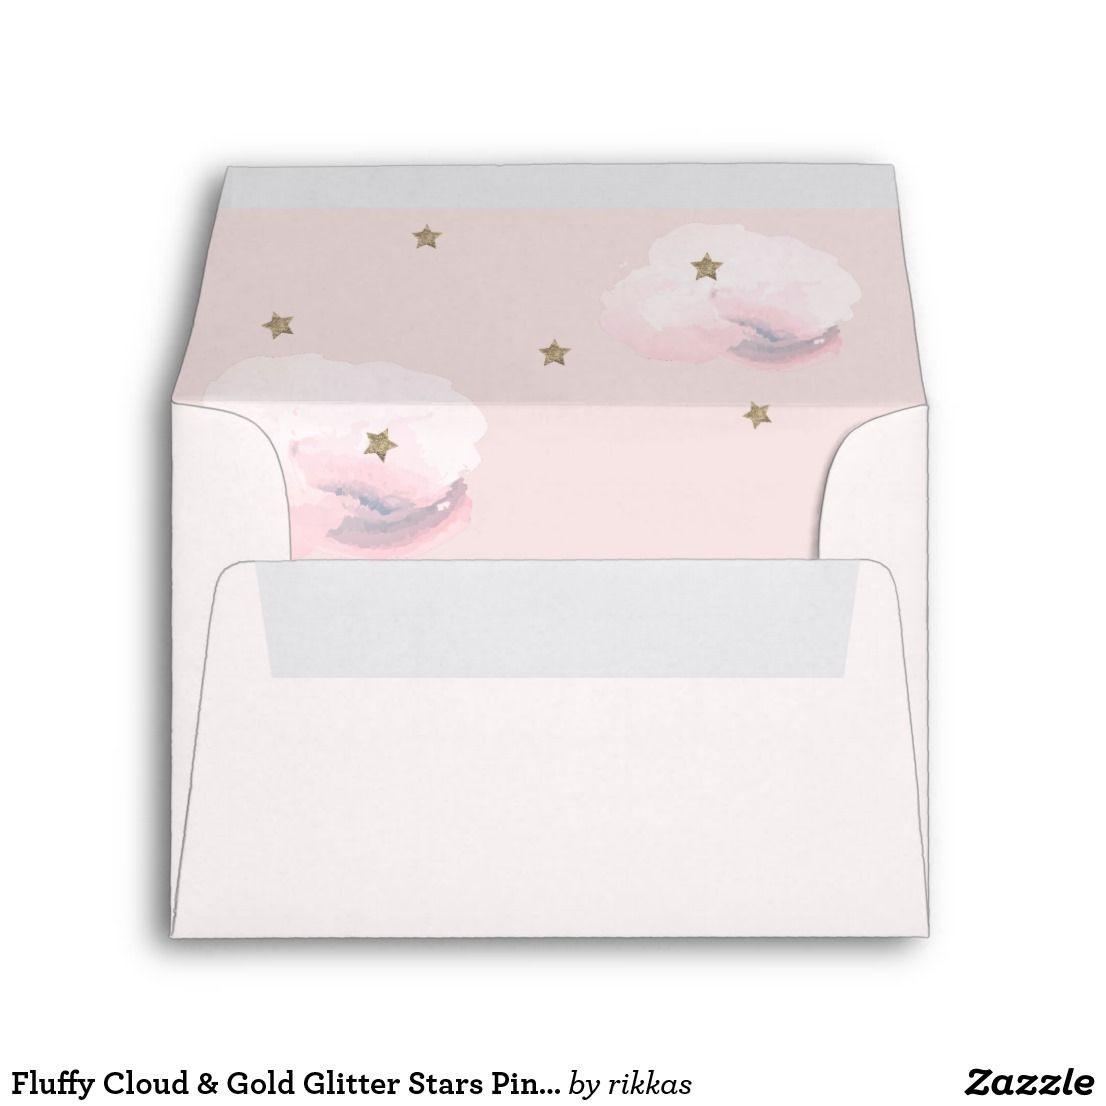 Fluffy Cloud & Gold Glitter Stars Pink Envelope | Zazzle.com #goldglitterbackground